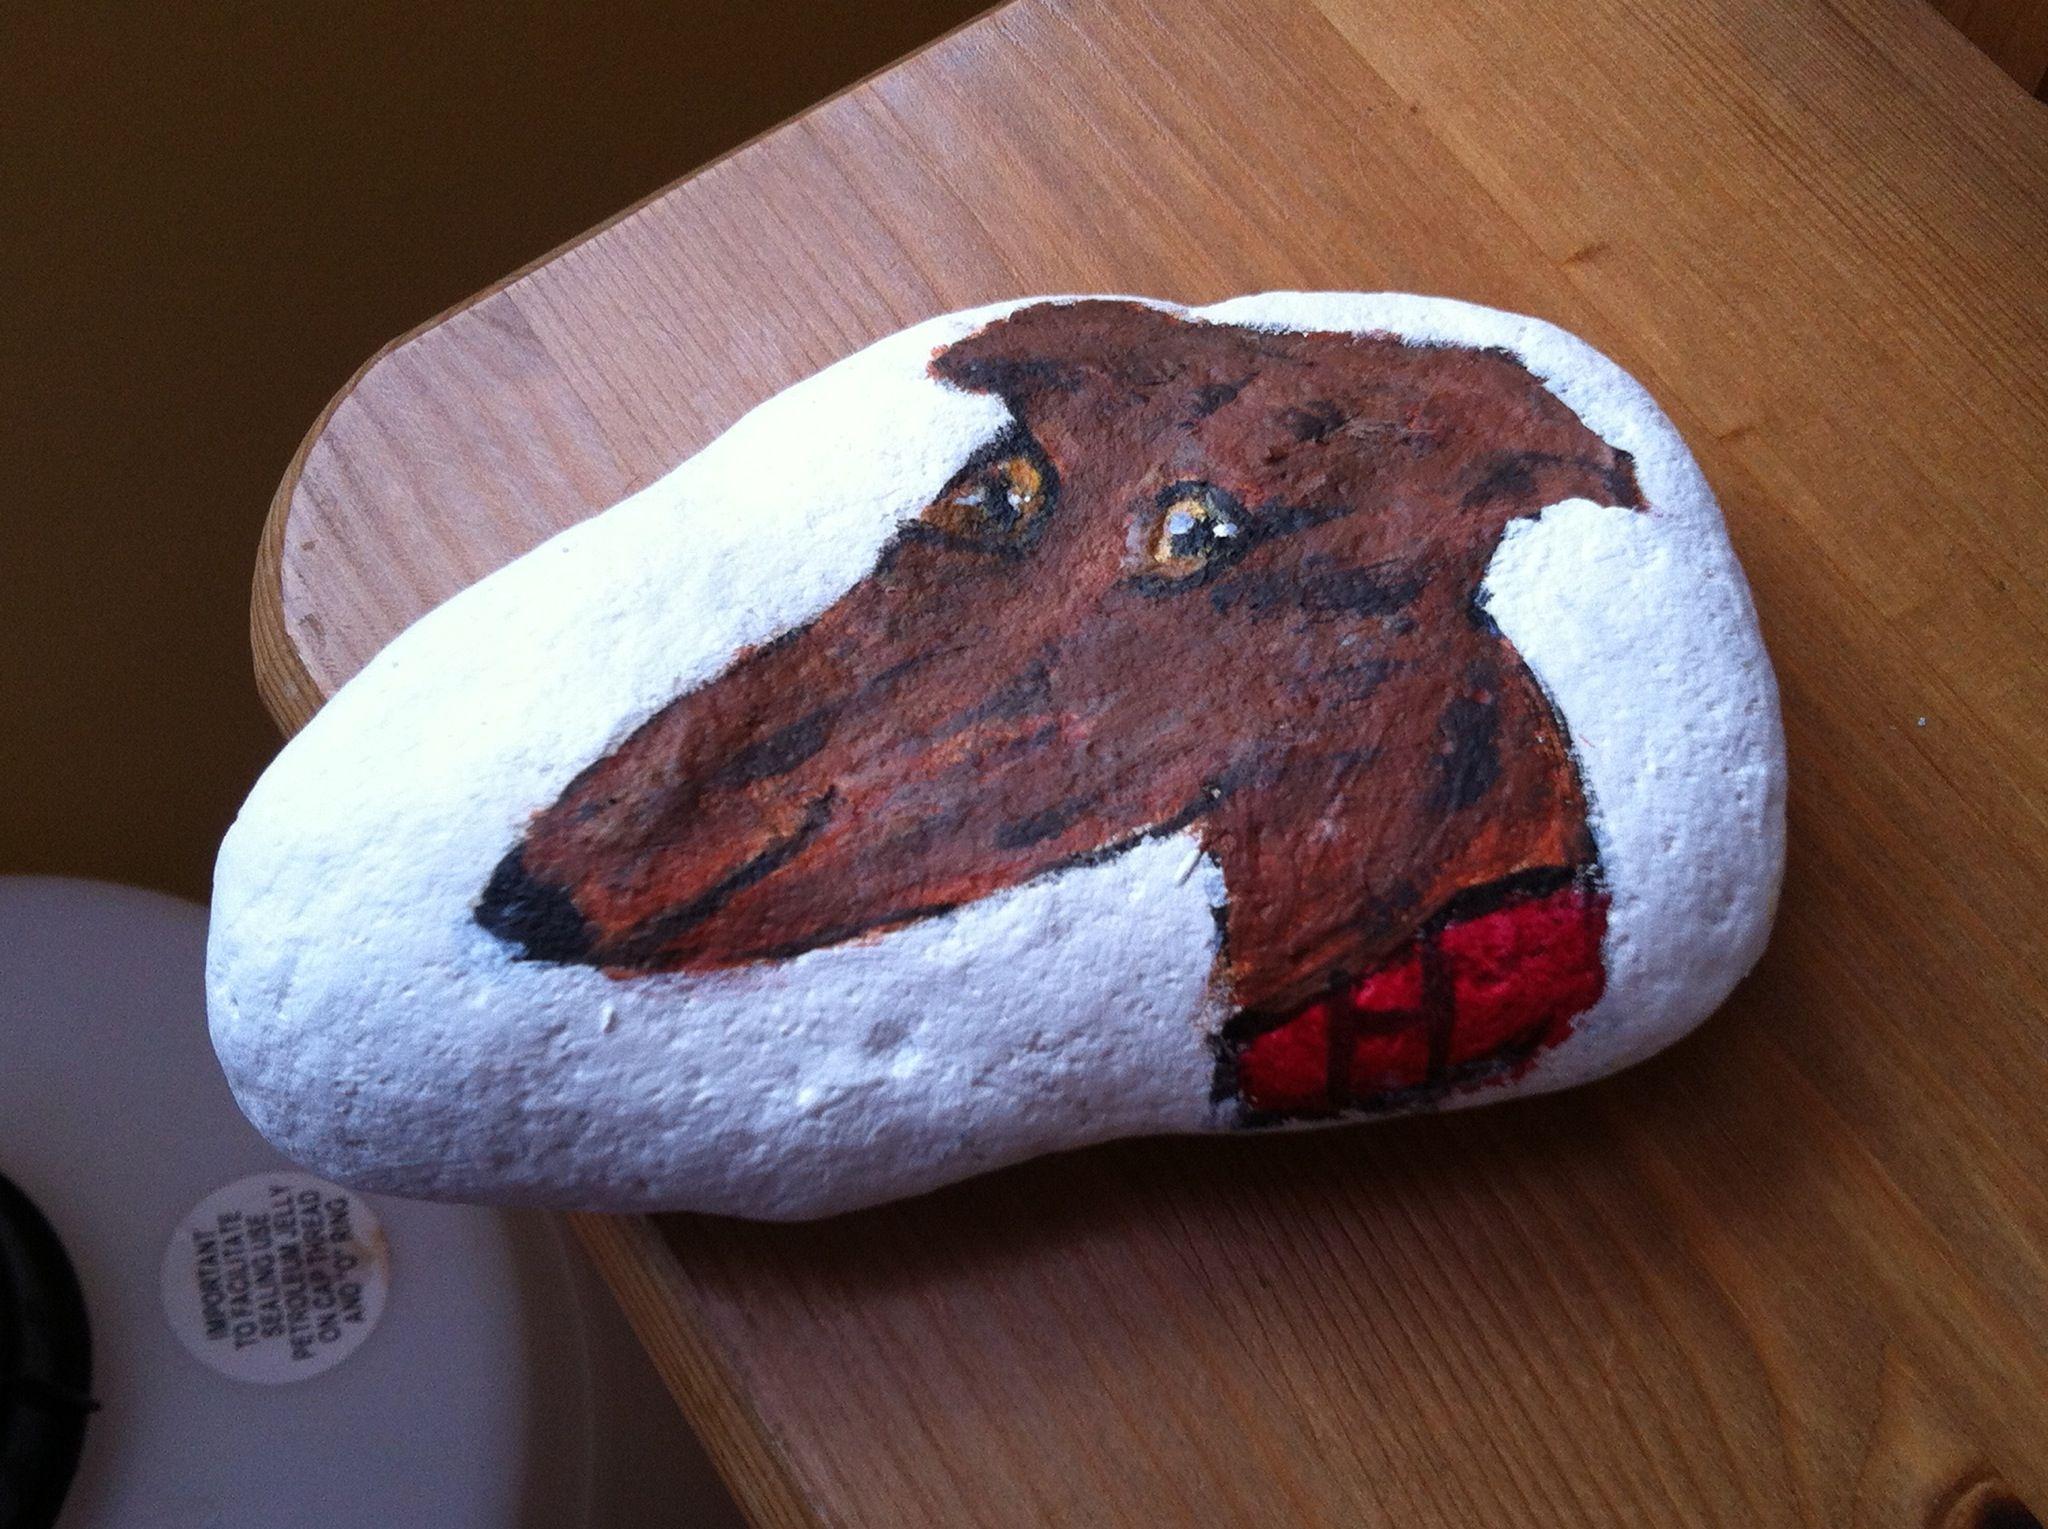 My Lurcher art done on stone Lurcher